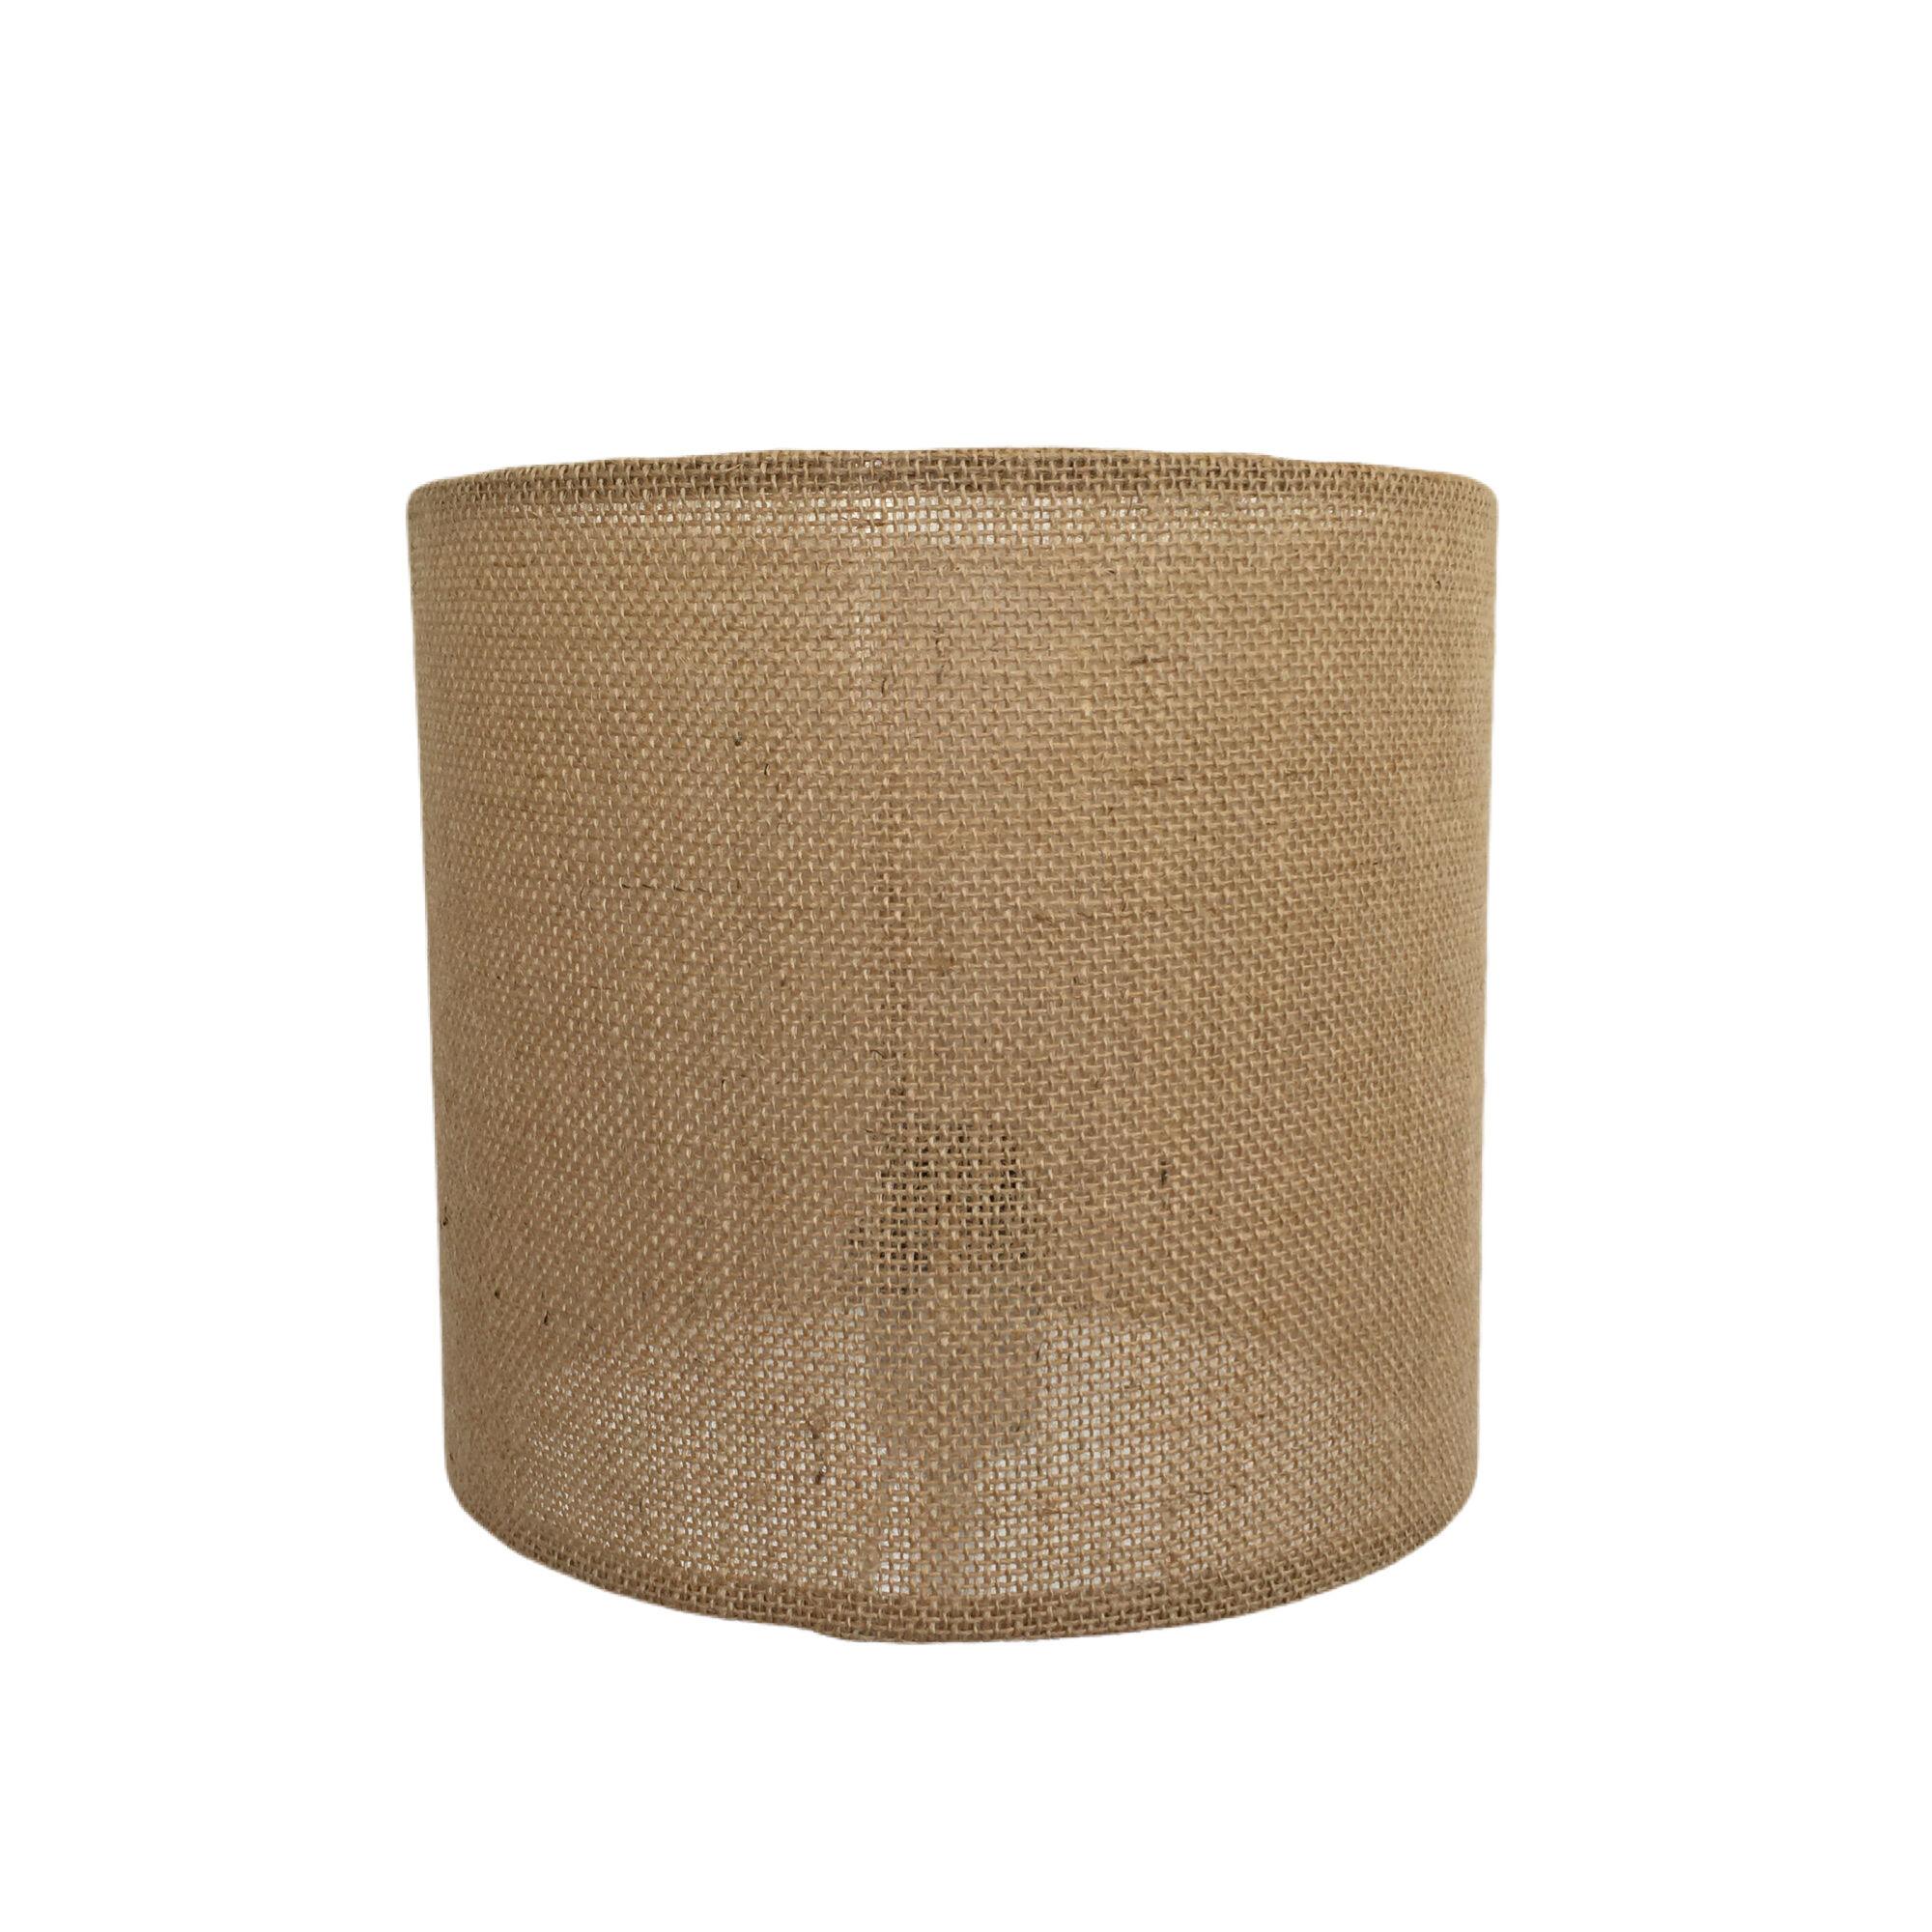 Belamp Suspension toile de jute diamètre 45 cm